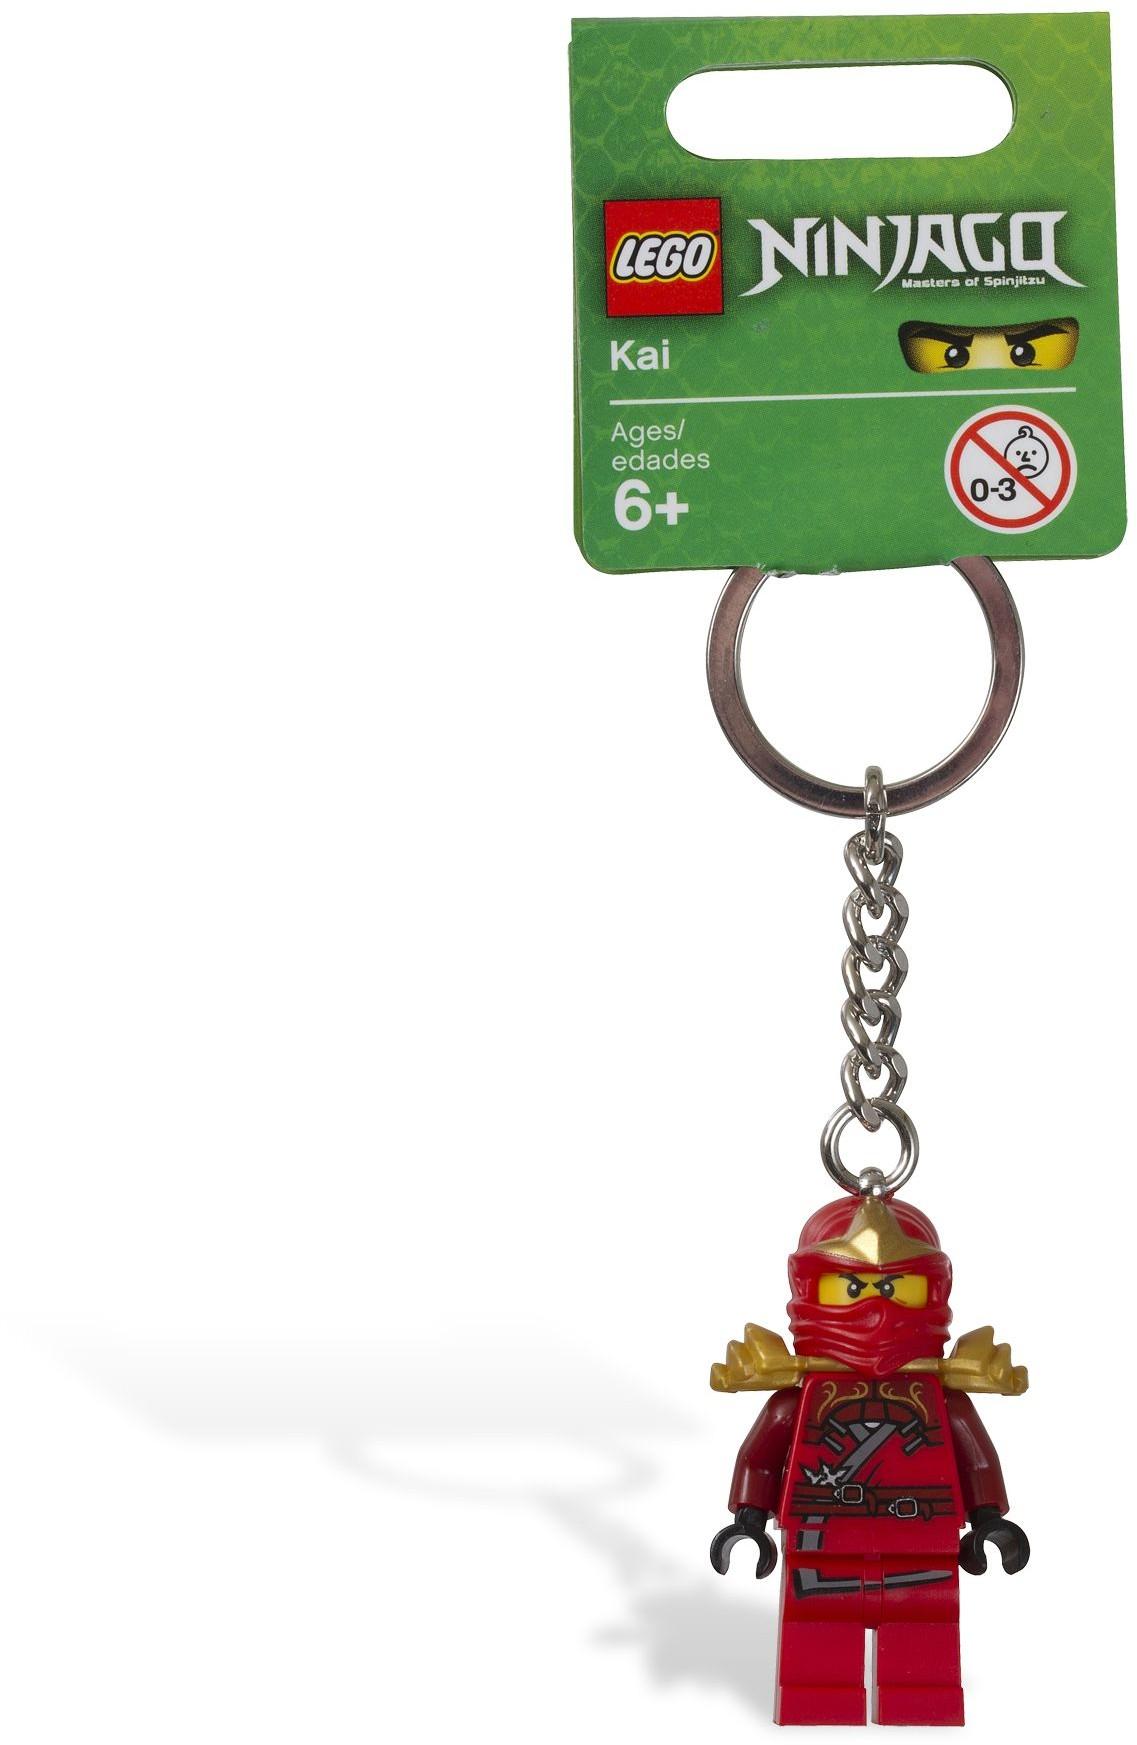 LEGO Ninjago Kai 2016 Key Chain 853690